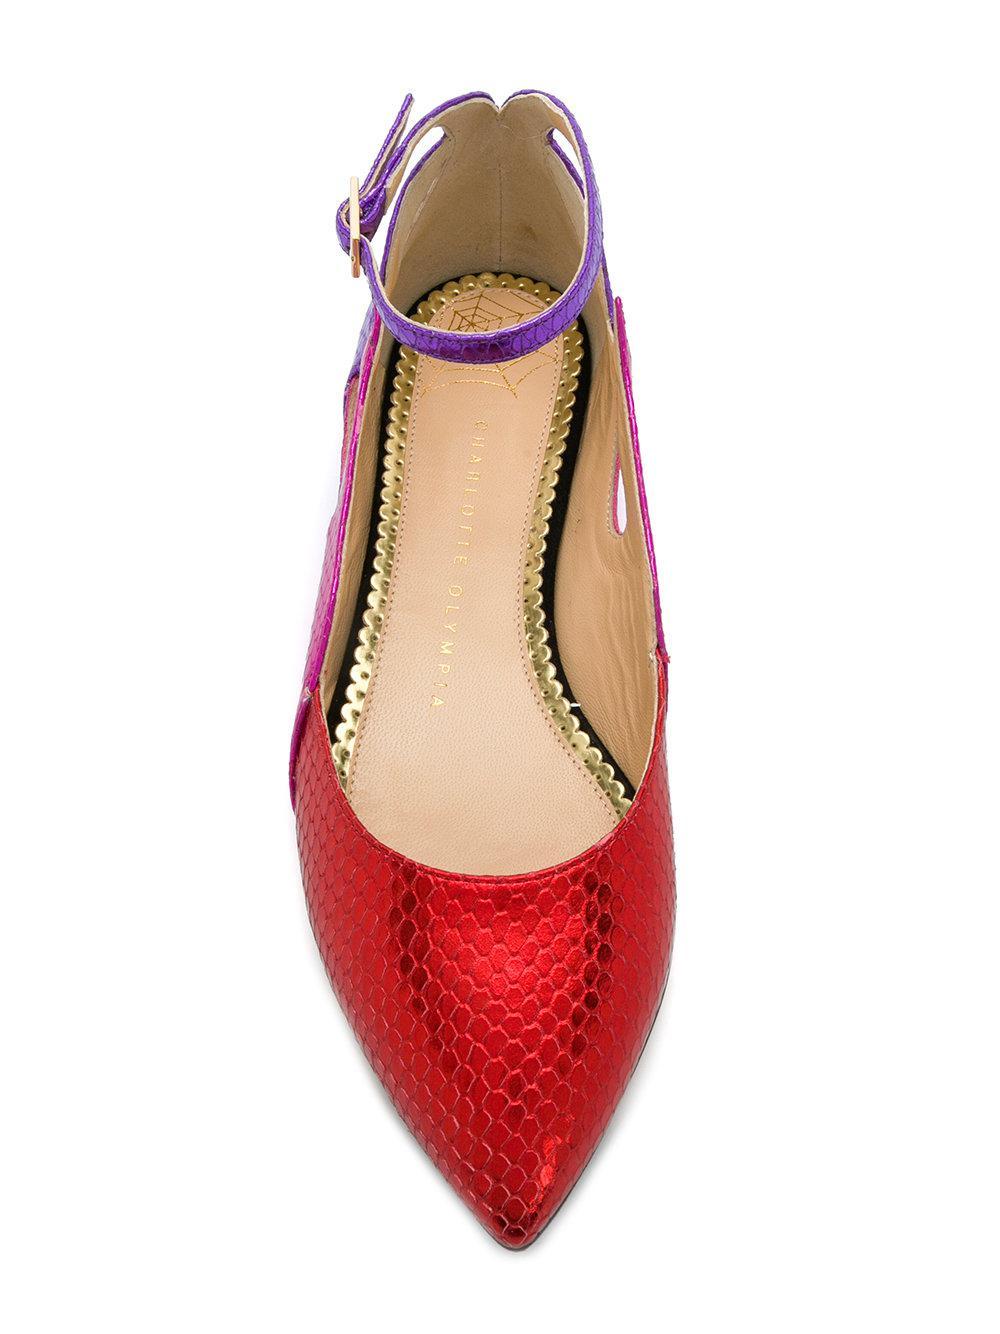 Charlotte Olympia Flamboyante Ballerines - Multicolor HH5ej